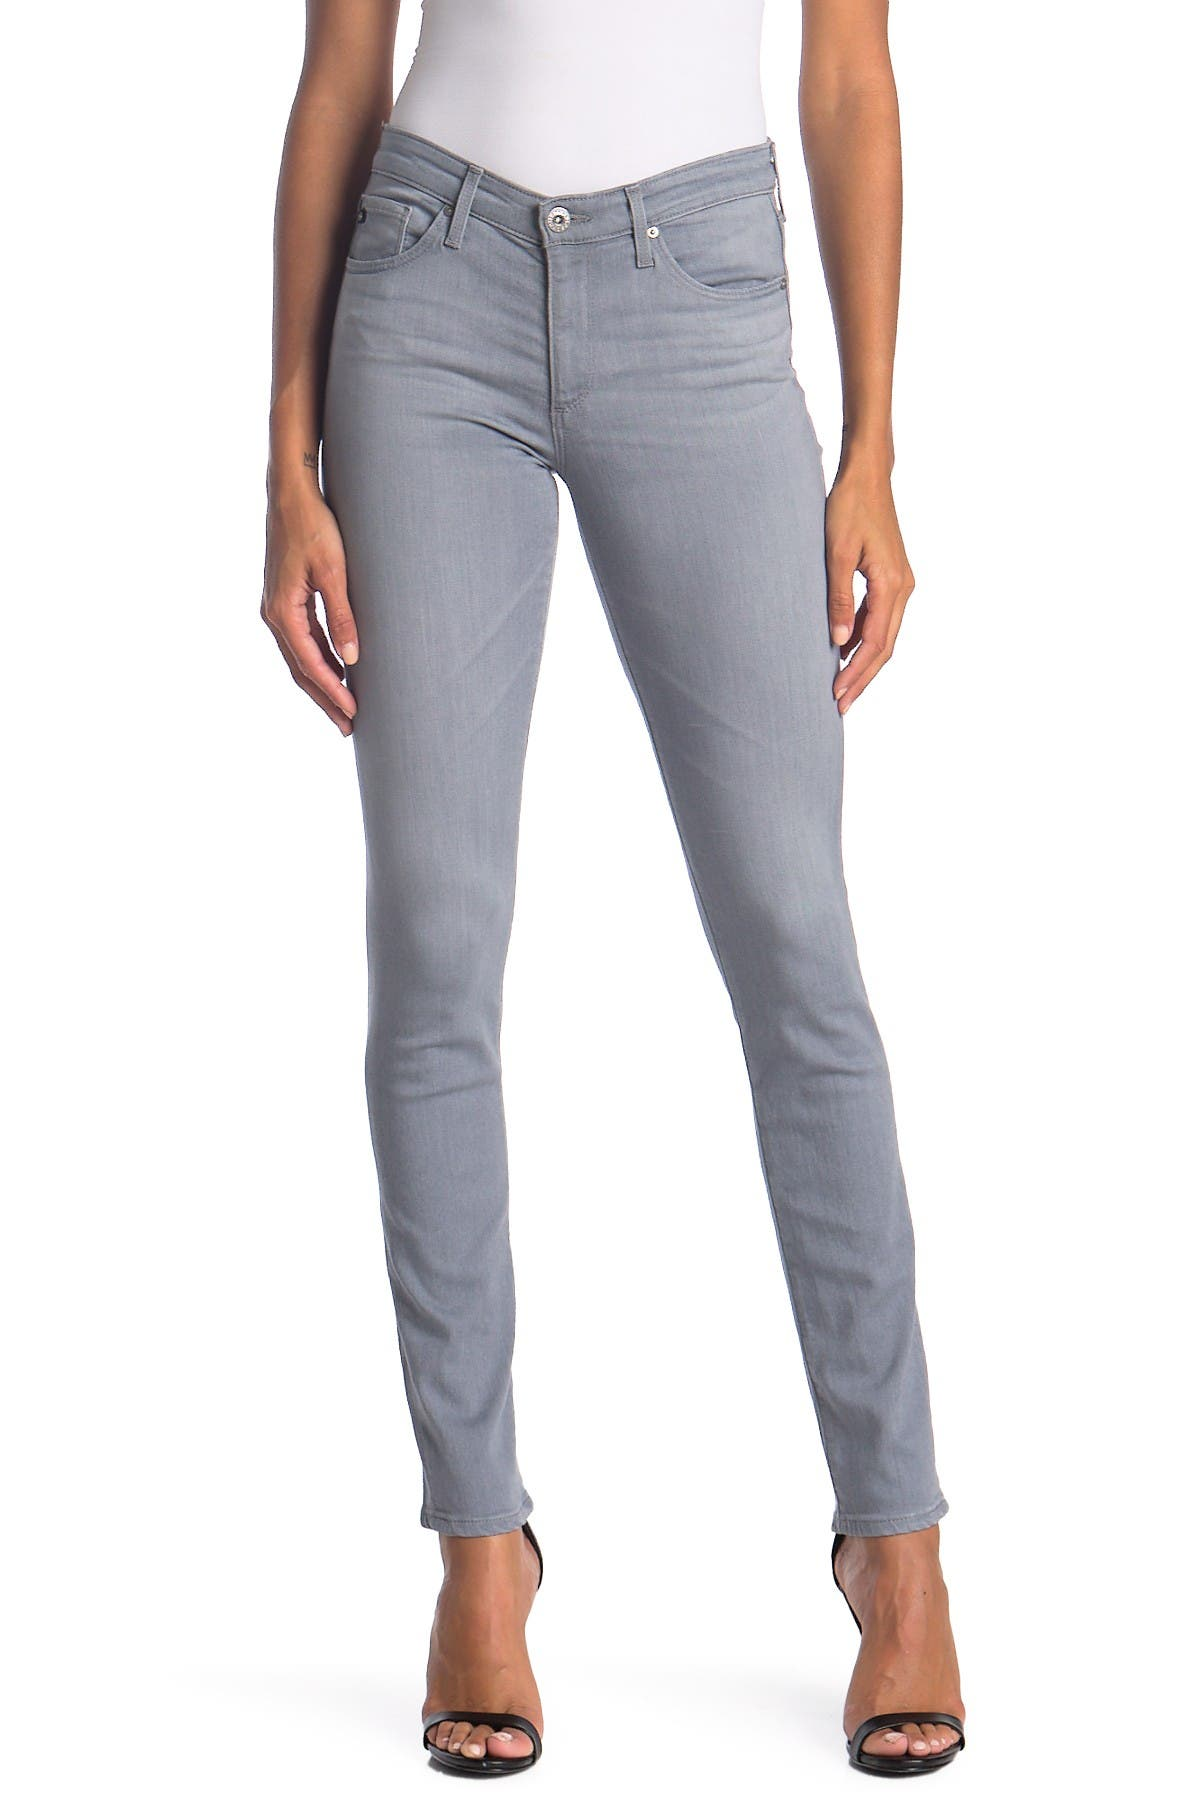 Image of AG Prima Straight Leg Jeans